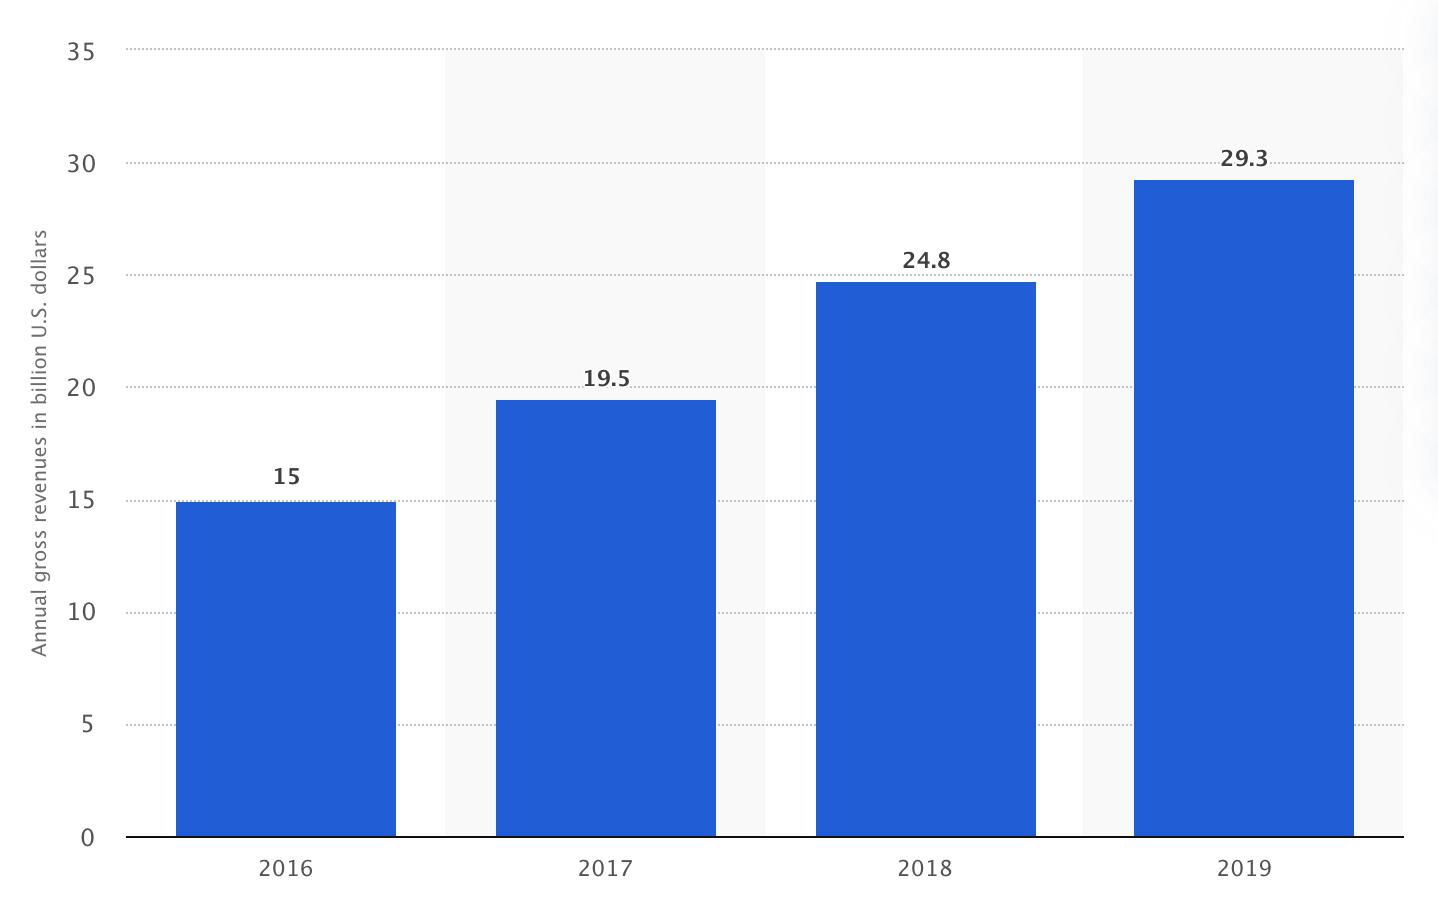 Google Play全球收入近年增长趋势 来源:statista.com